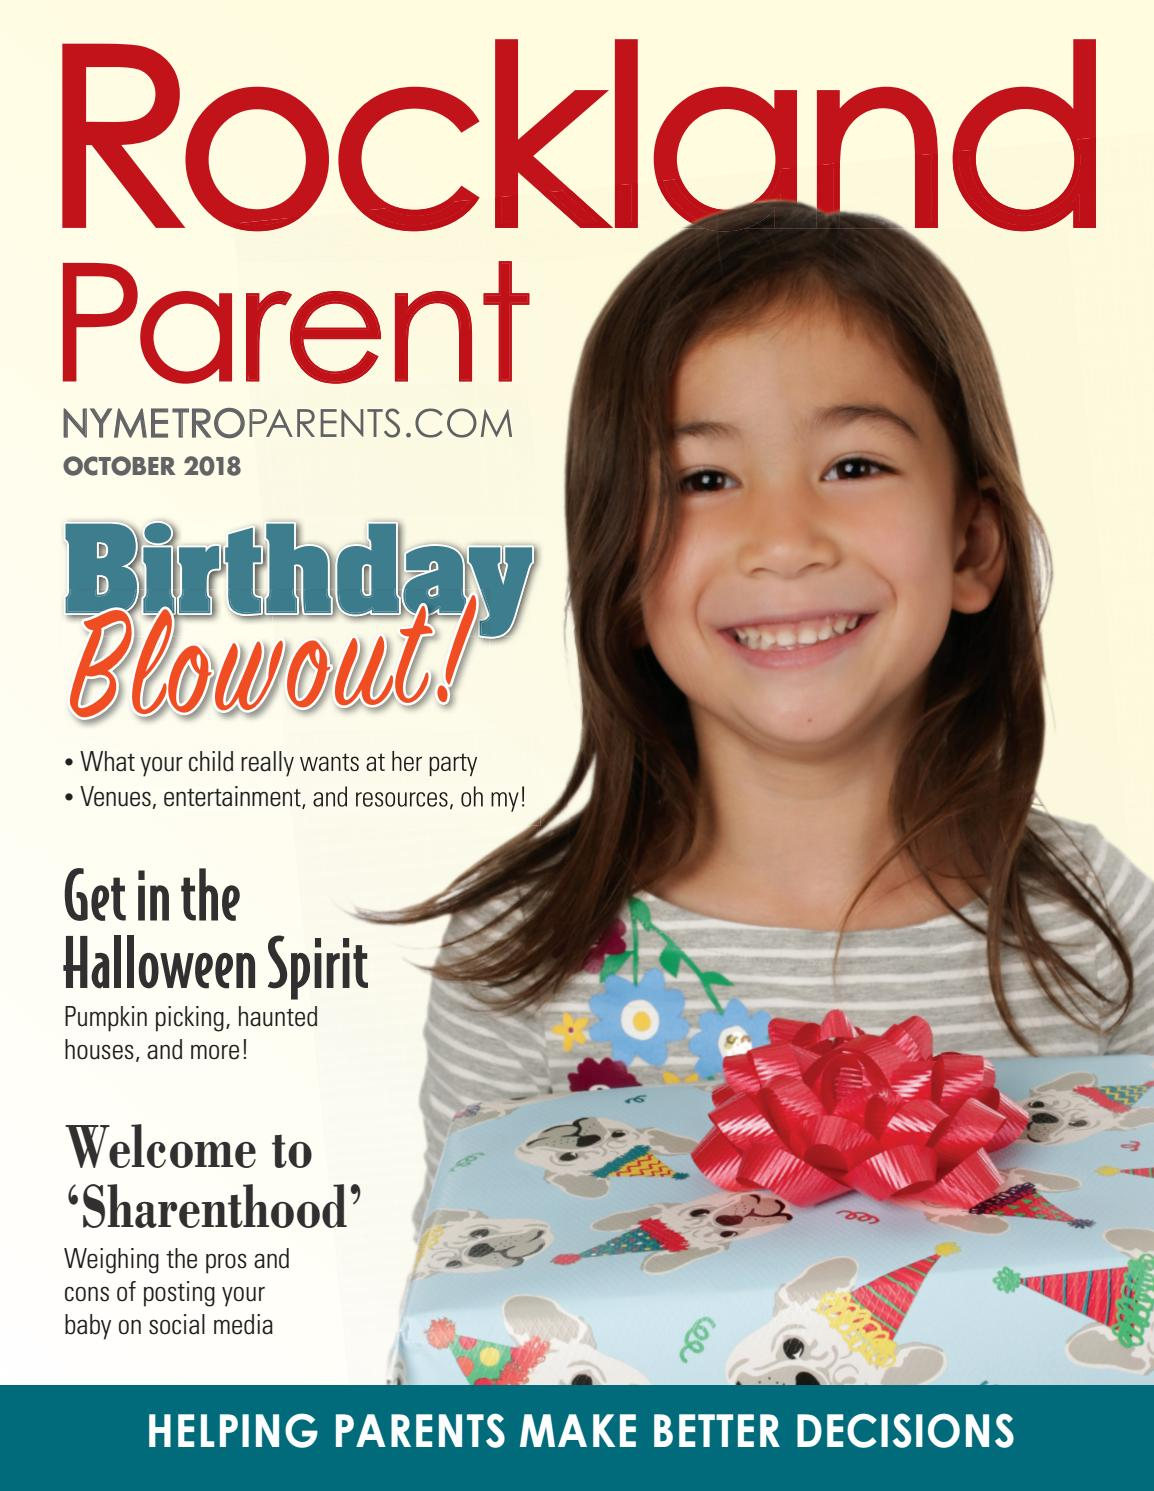 Rockland Parent October 2018 by Davler Media - issuu